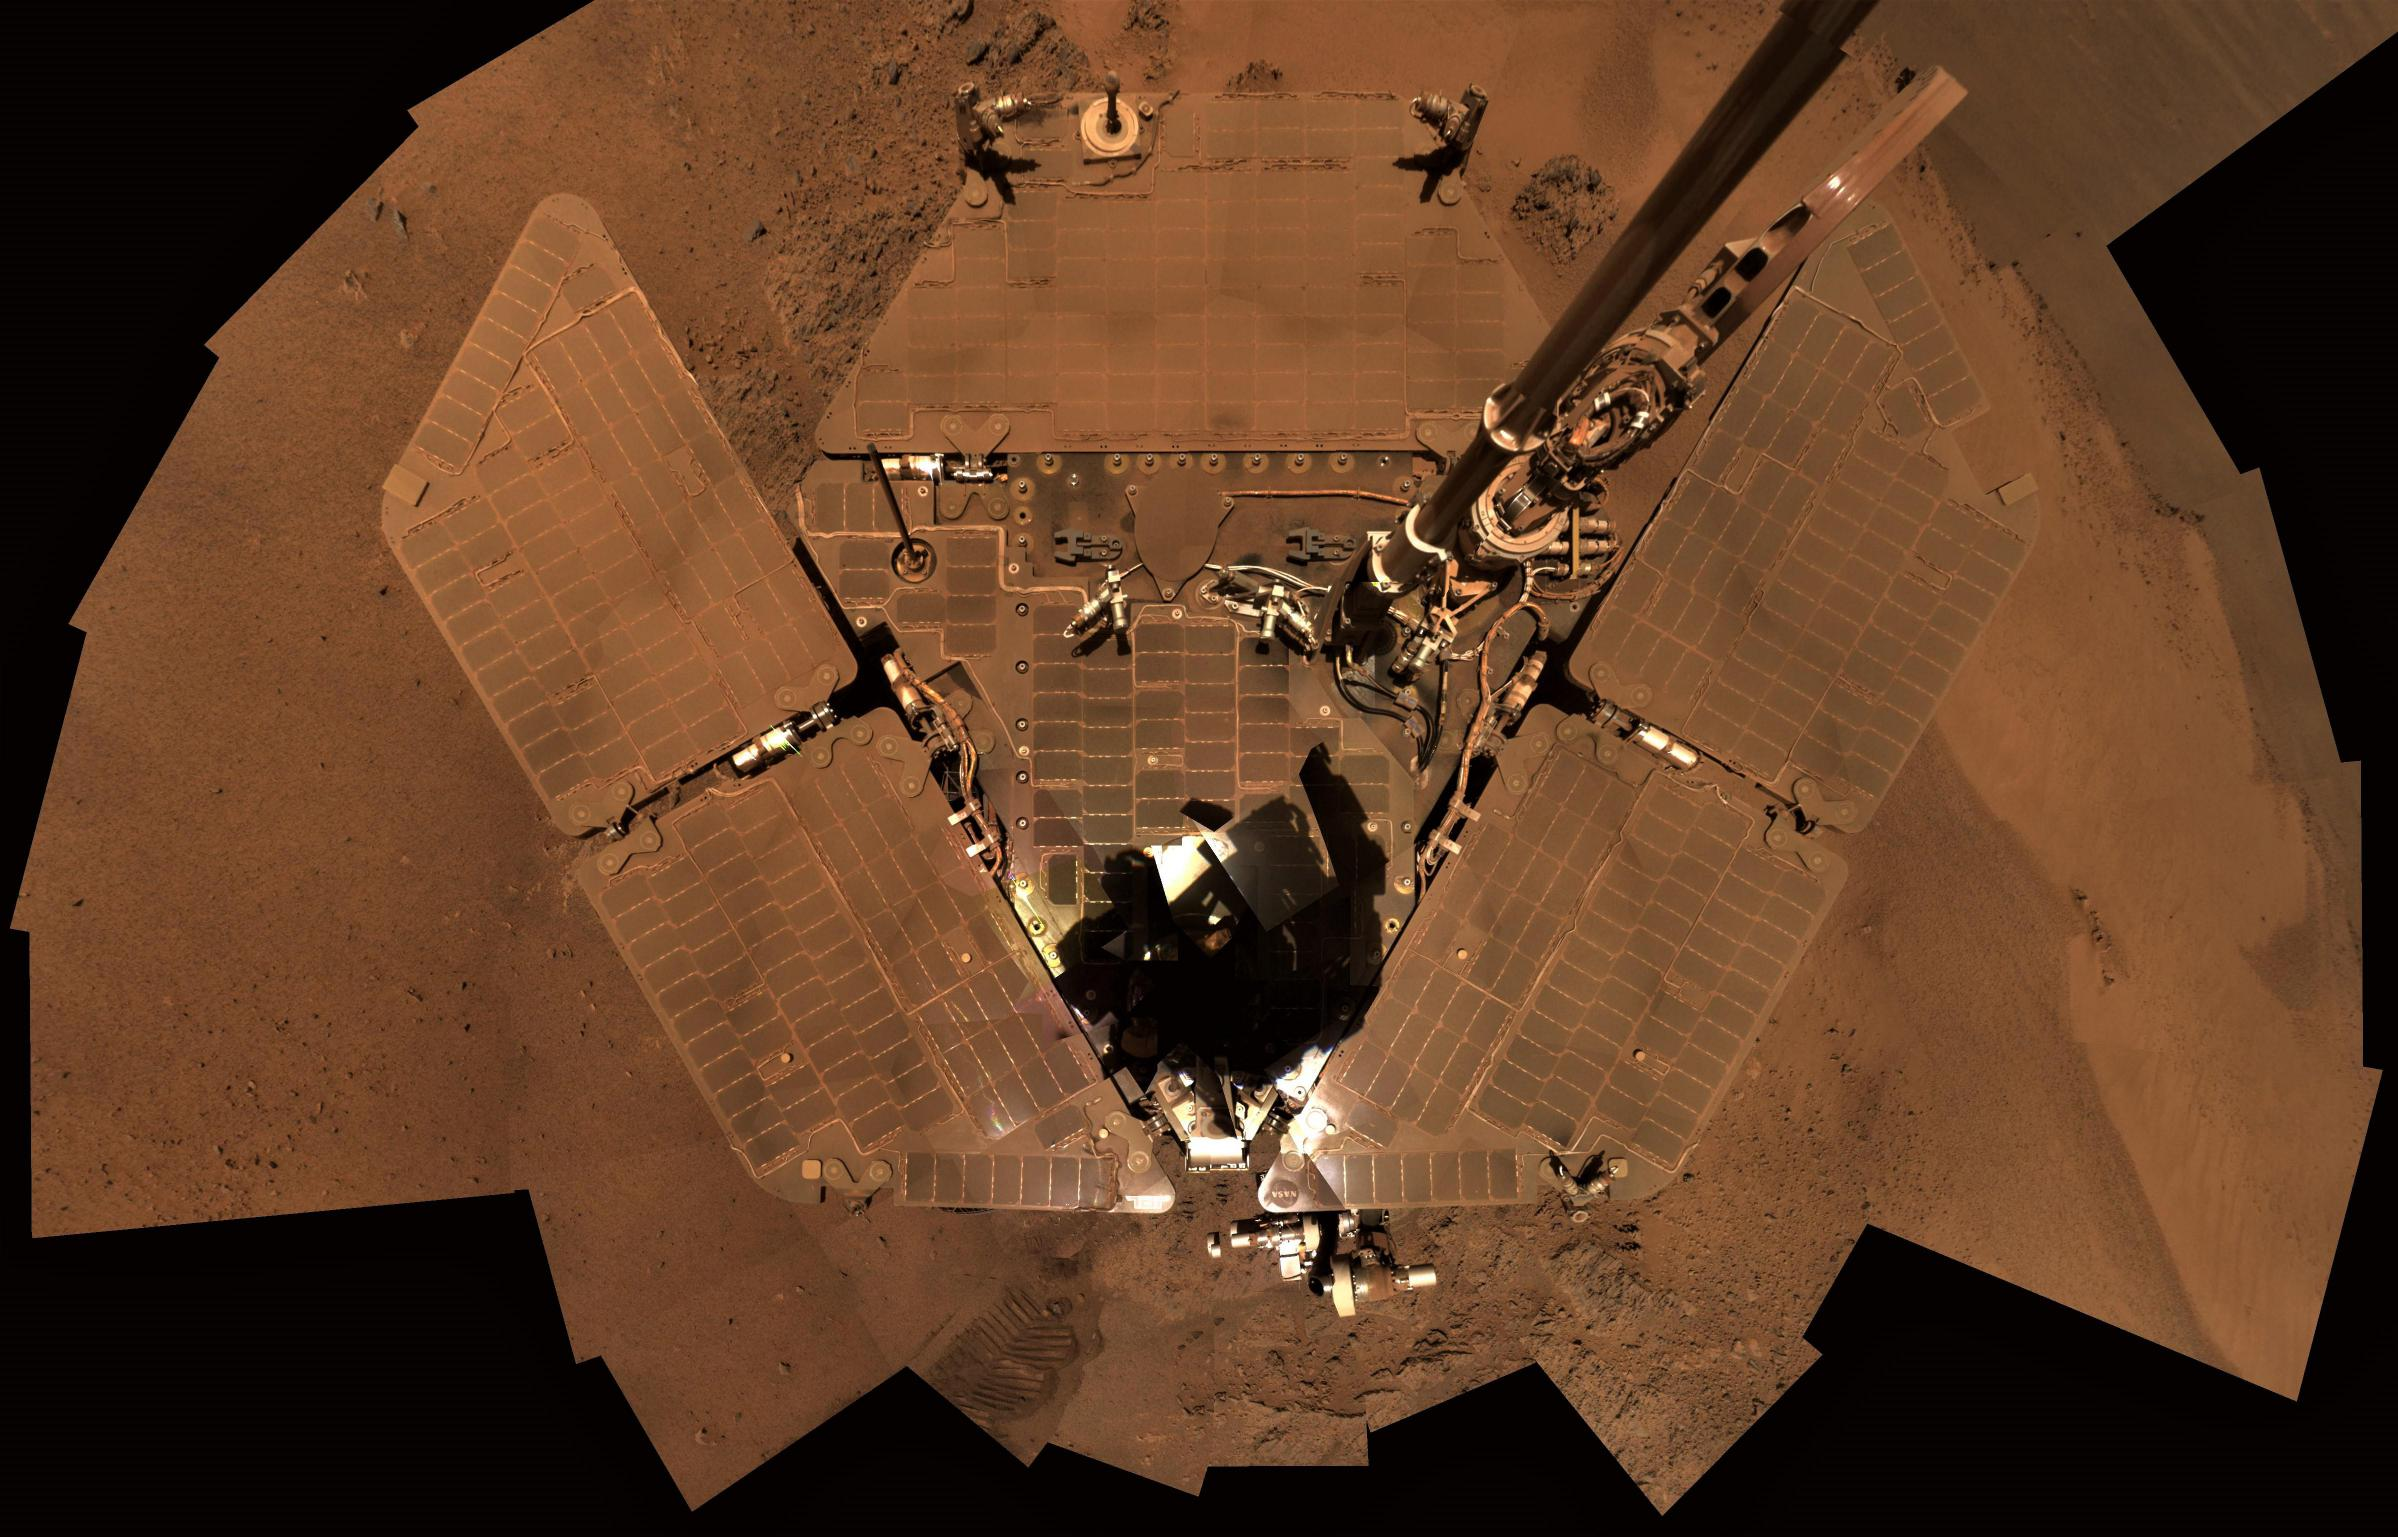 Opportunity dusty solar arrays Dec 2011 (NASA, JPL)(c)